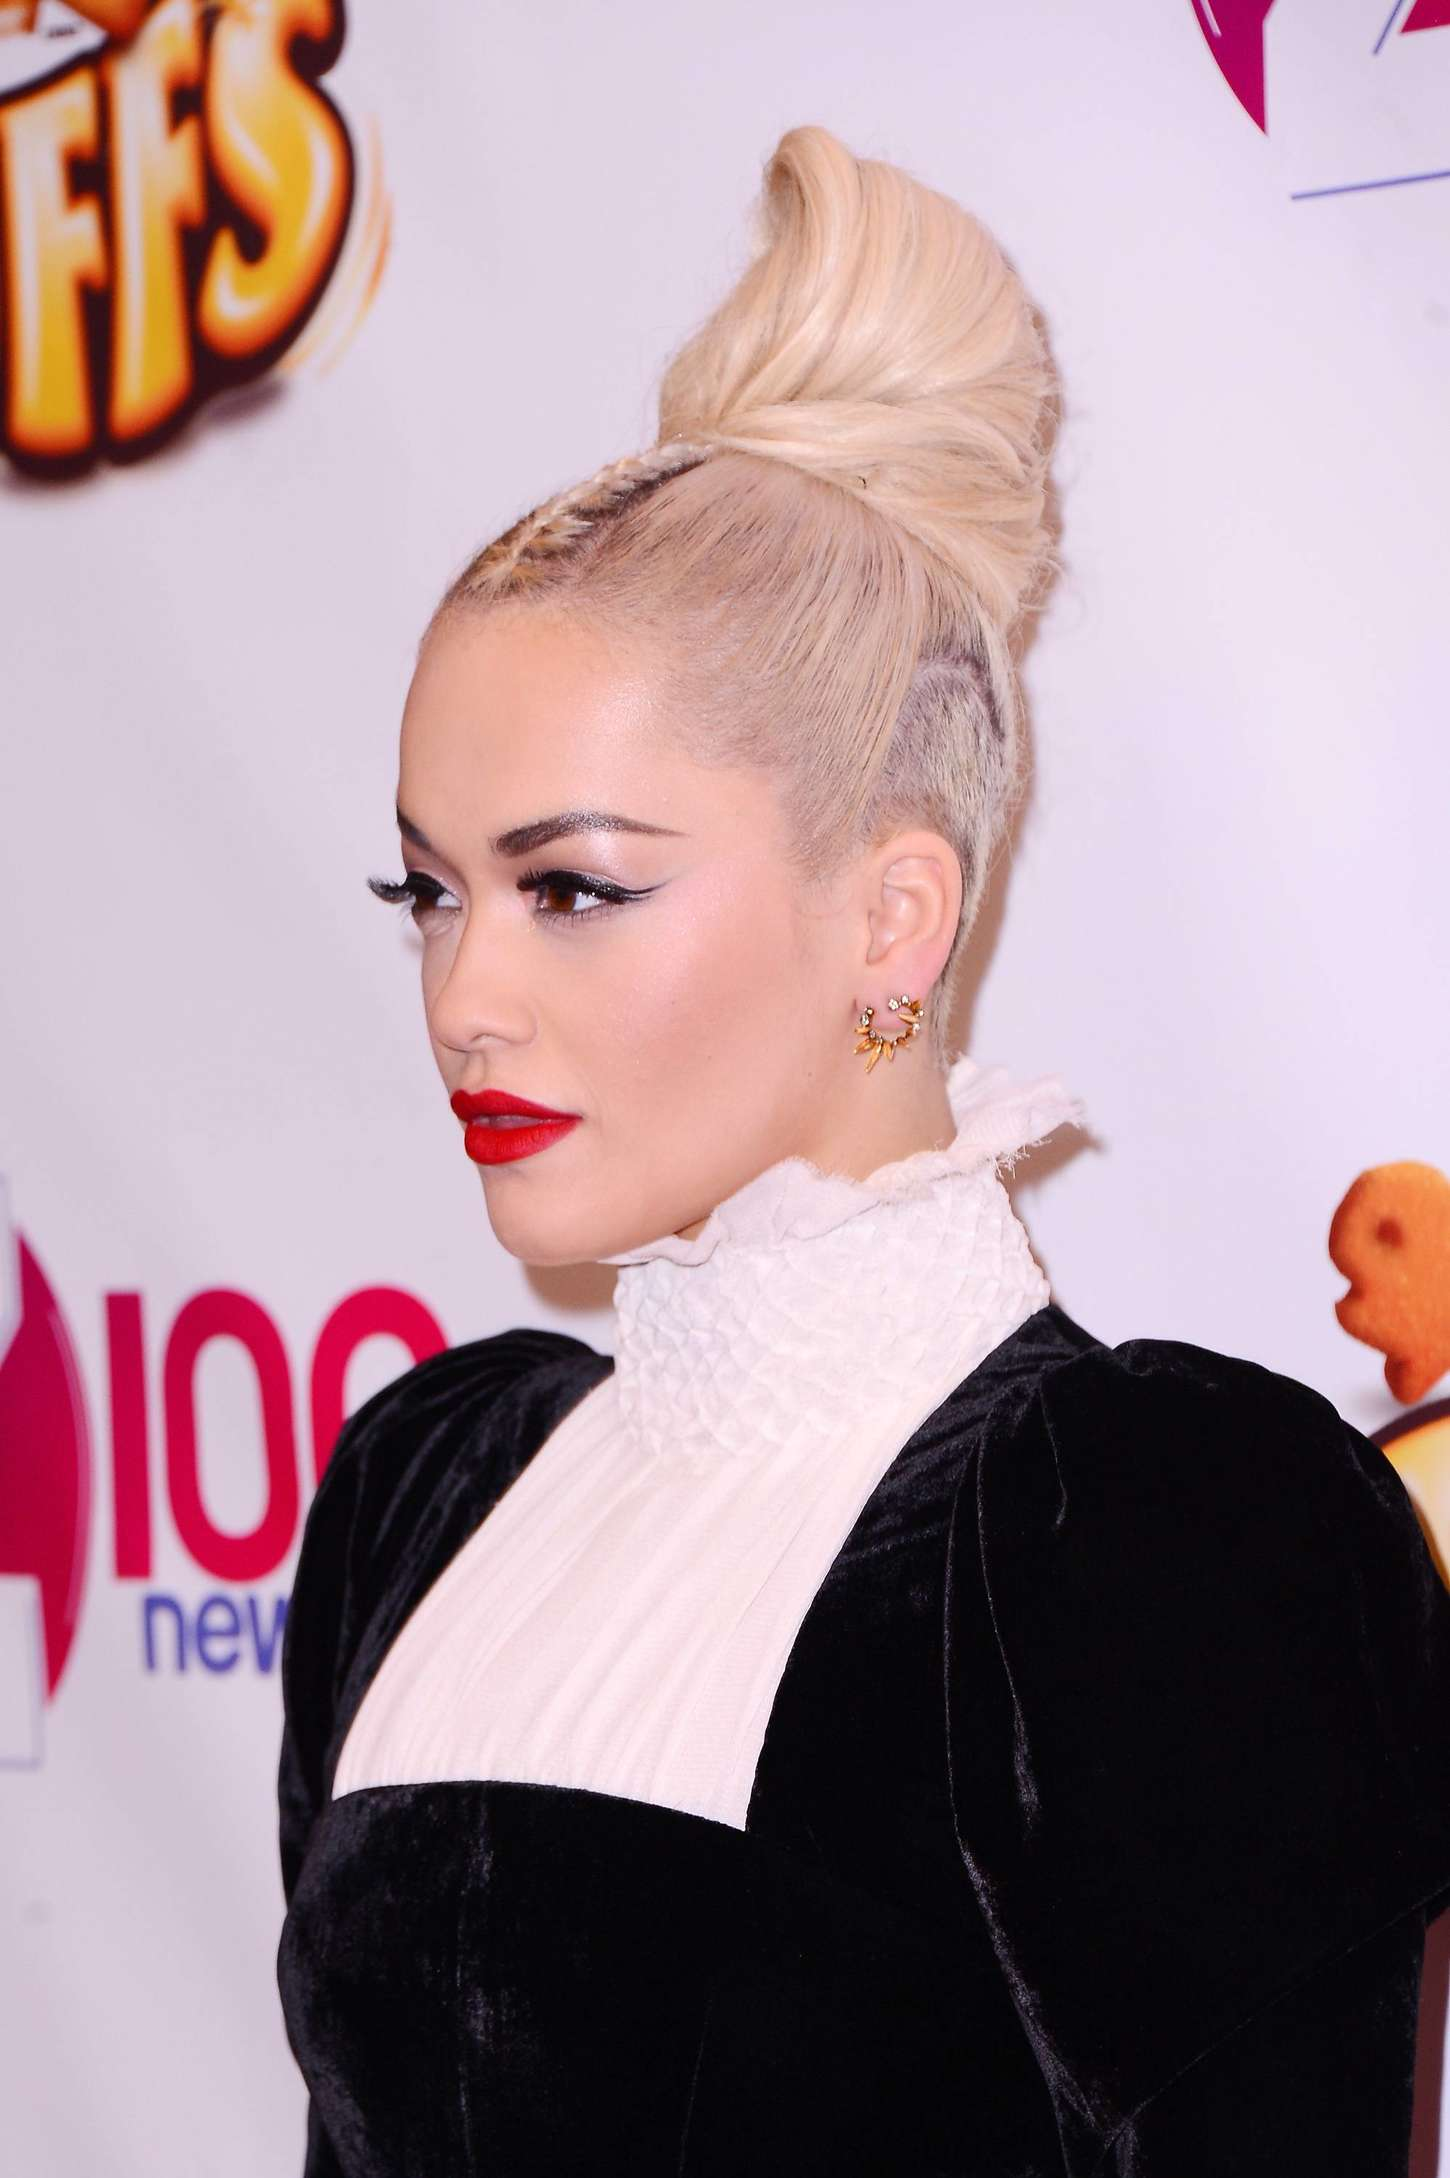 Rita Ora 2014 : Rita Ora: Z100s Jingle Ball 2014 -67